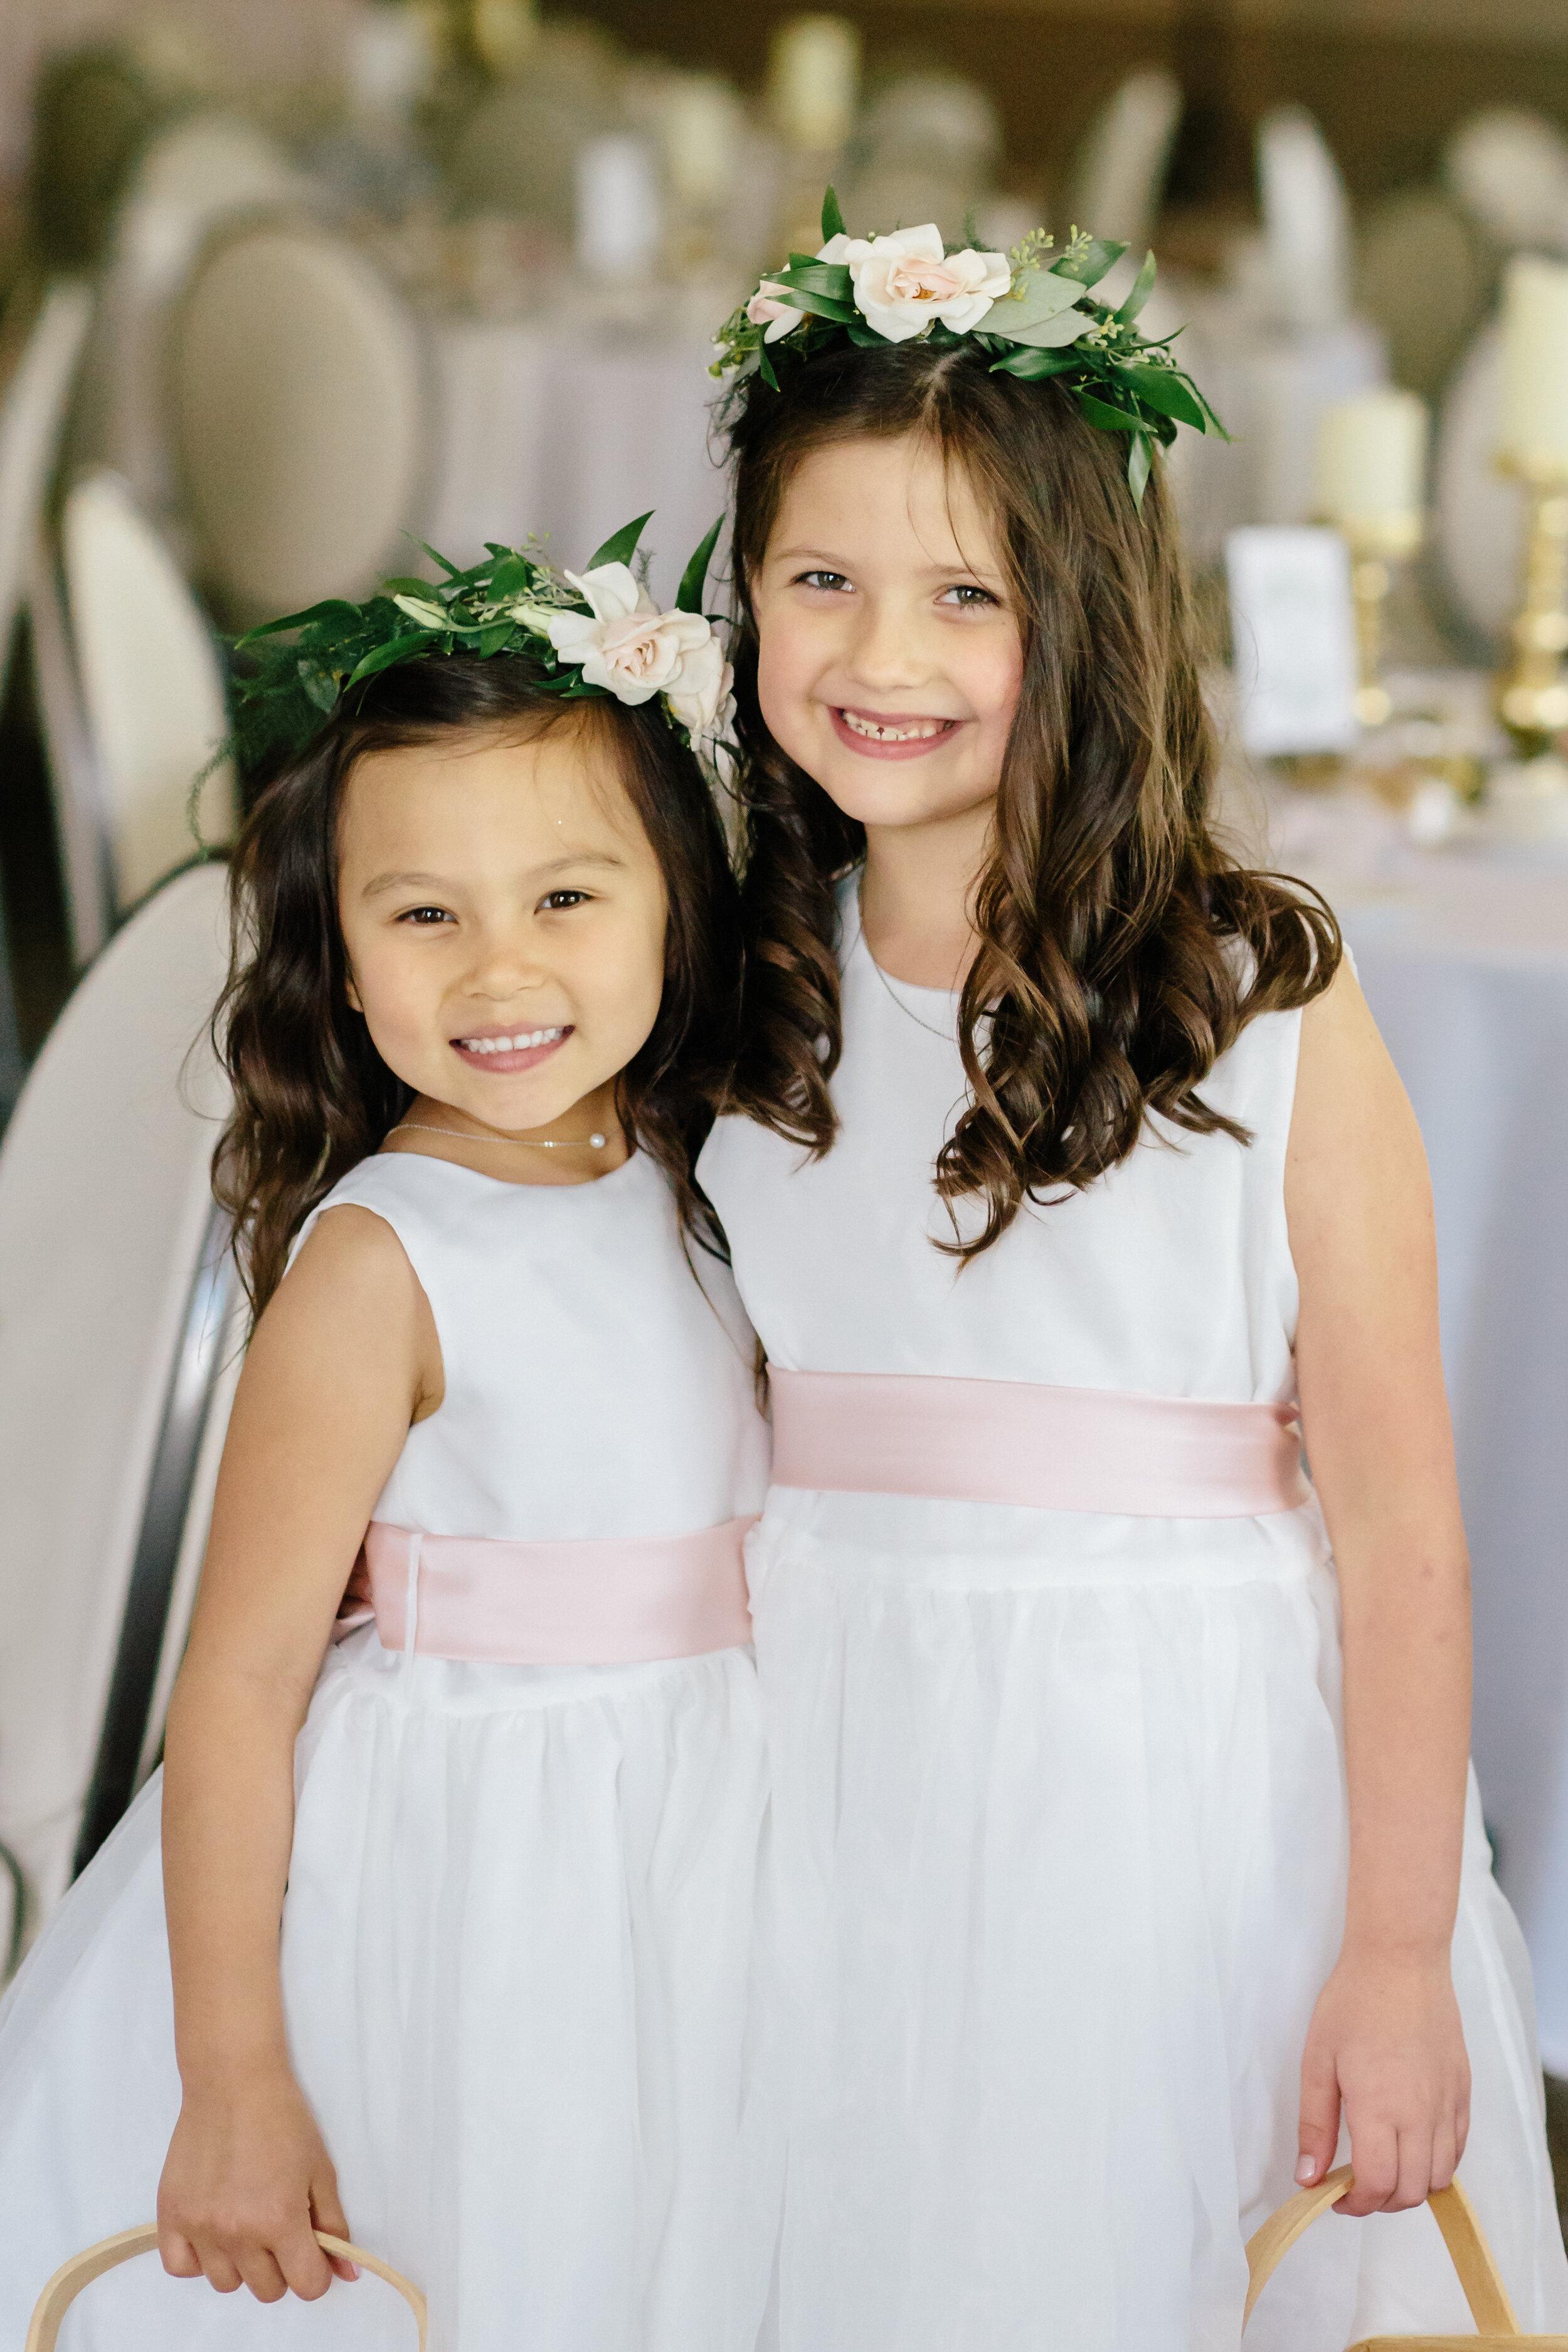 S&B Wedding - Family & Wedding Party-157.jpg